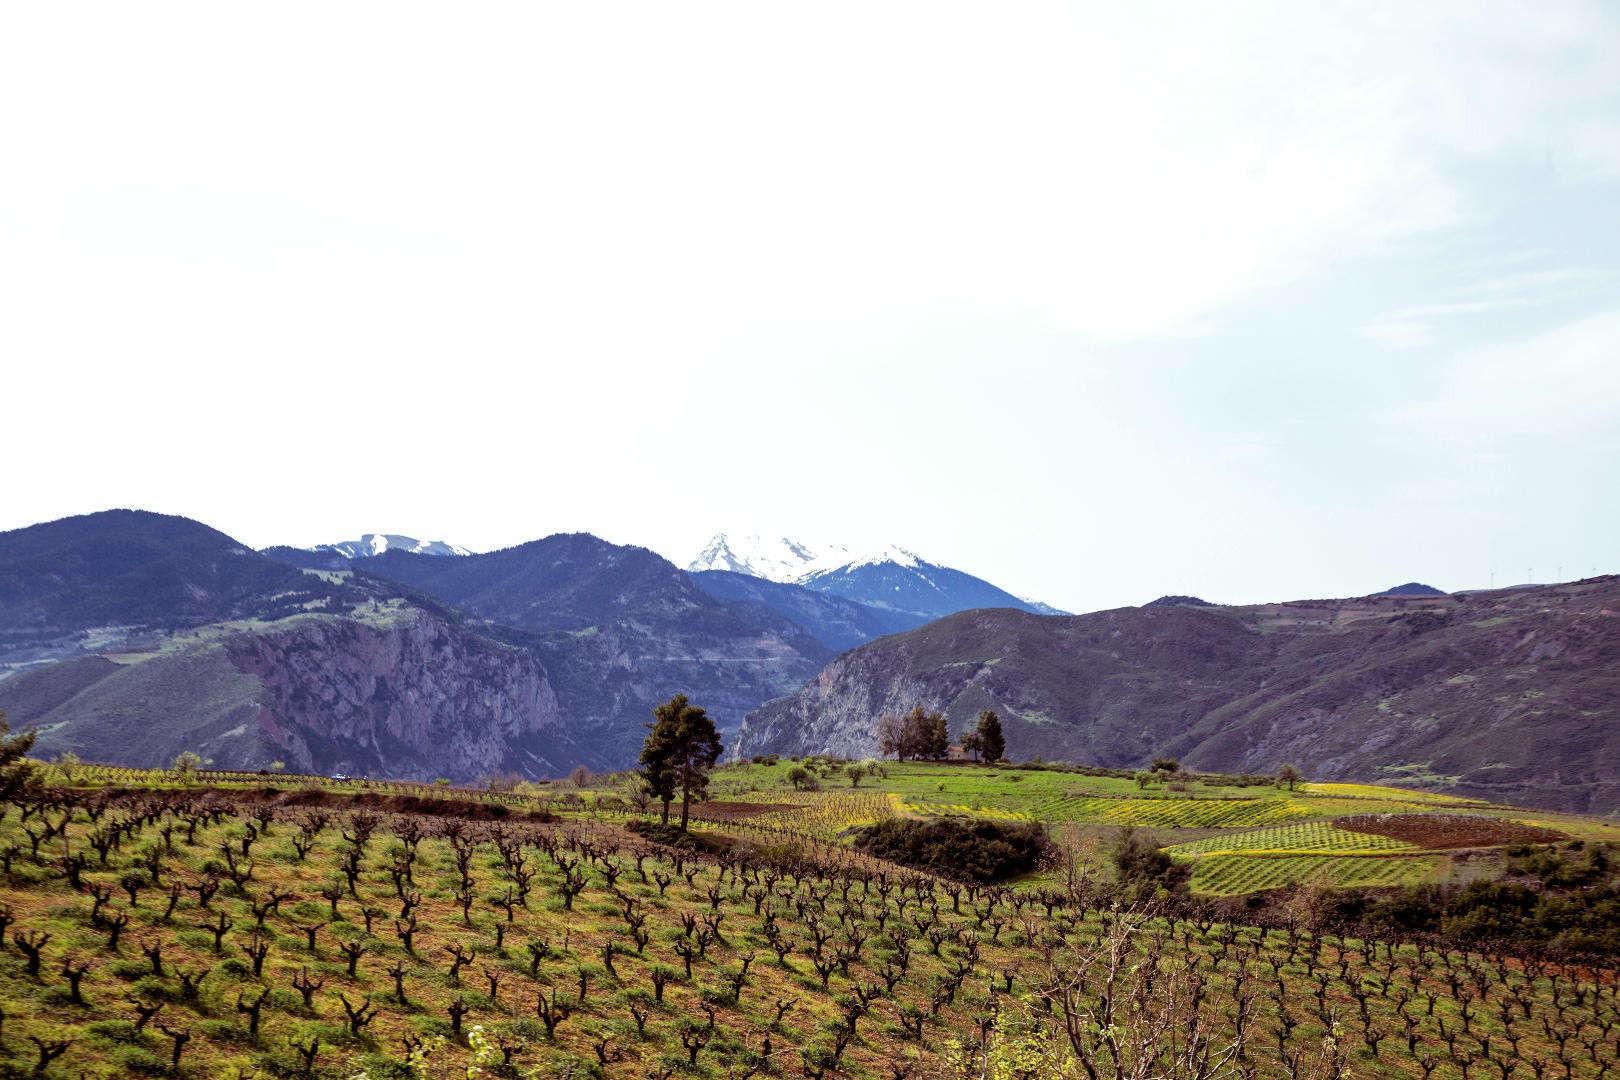 acheon-winery-aigielaia-region-1-opt